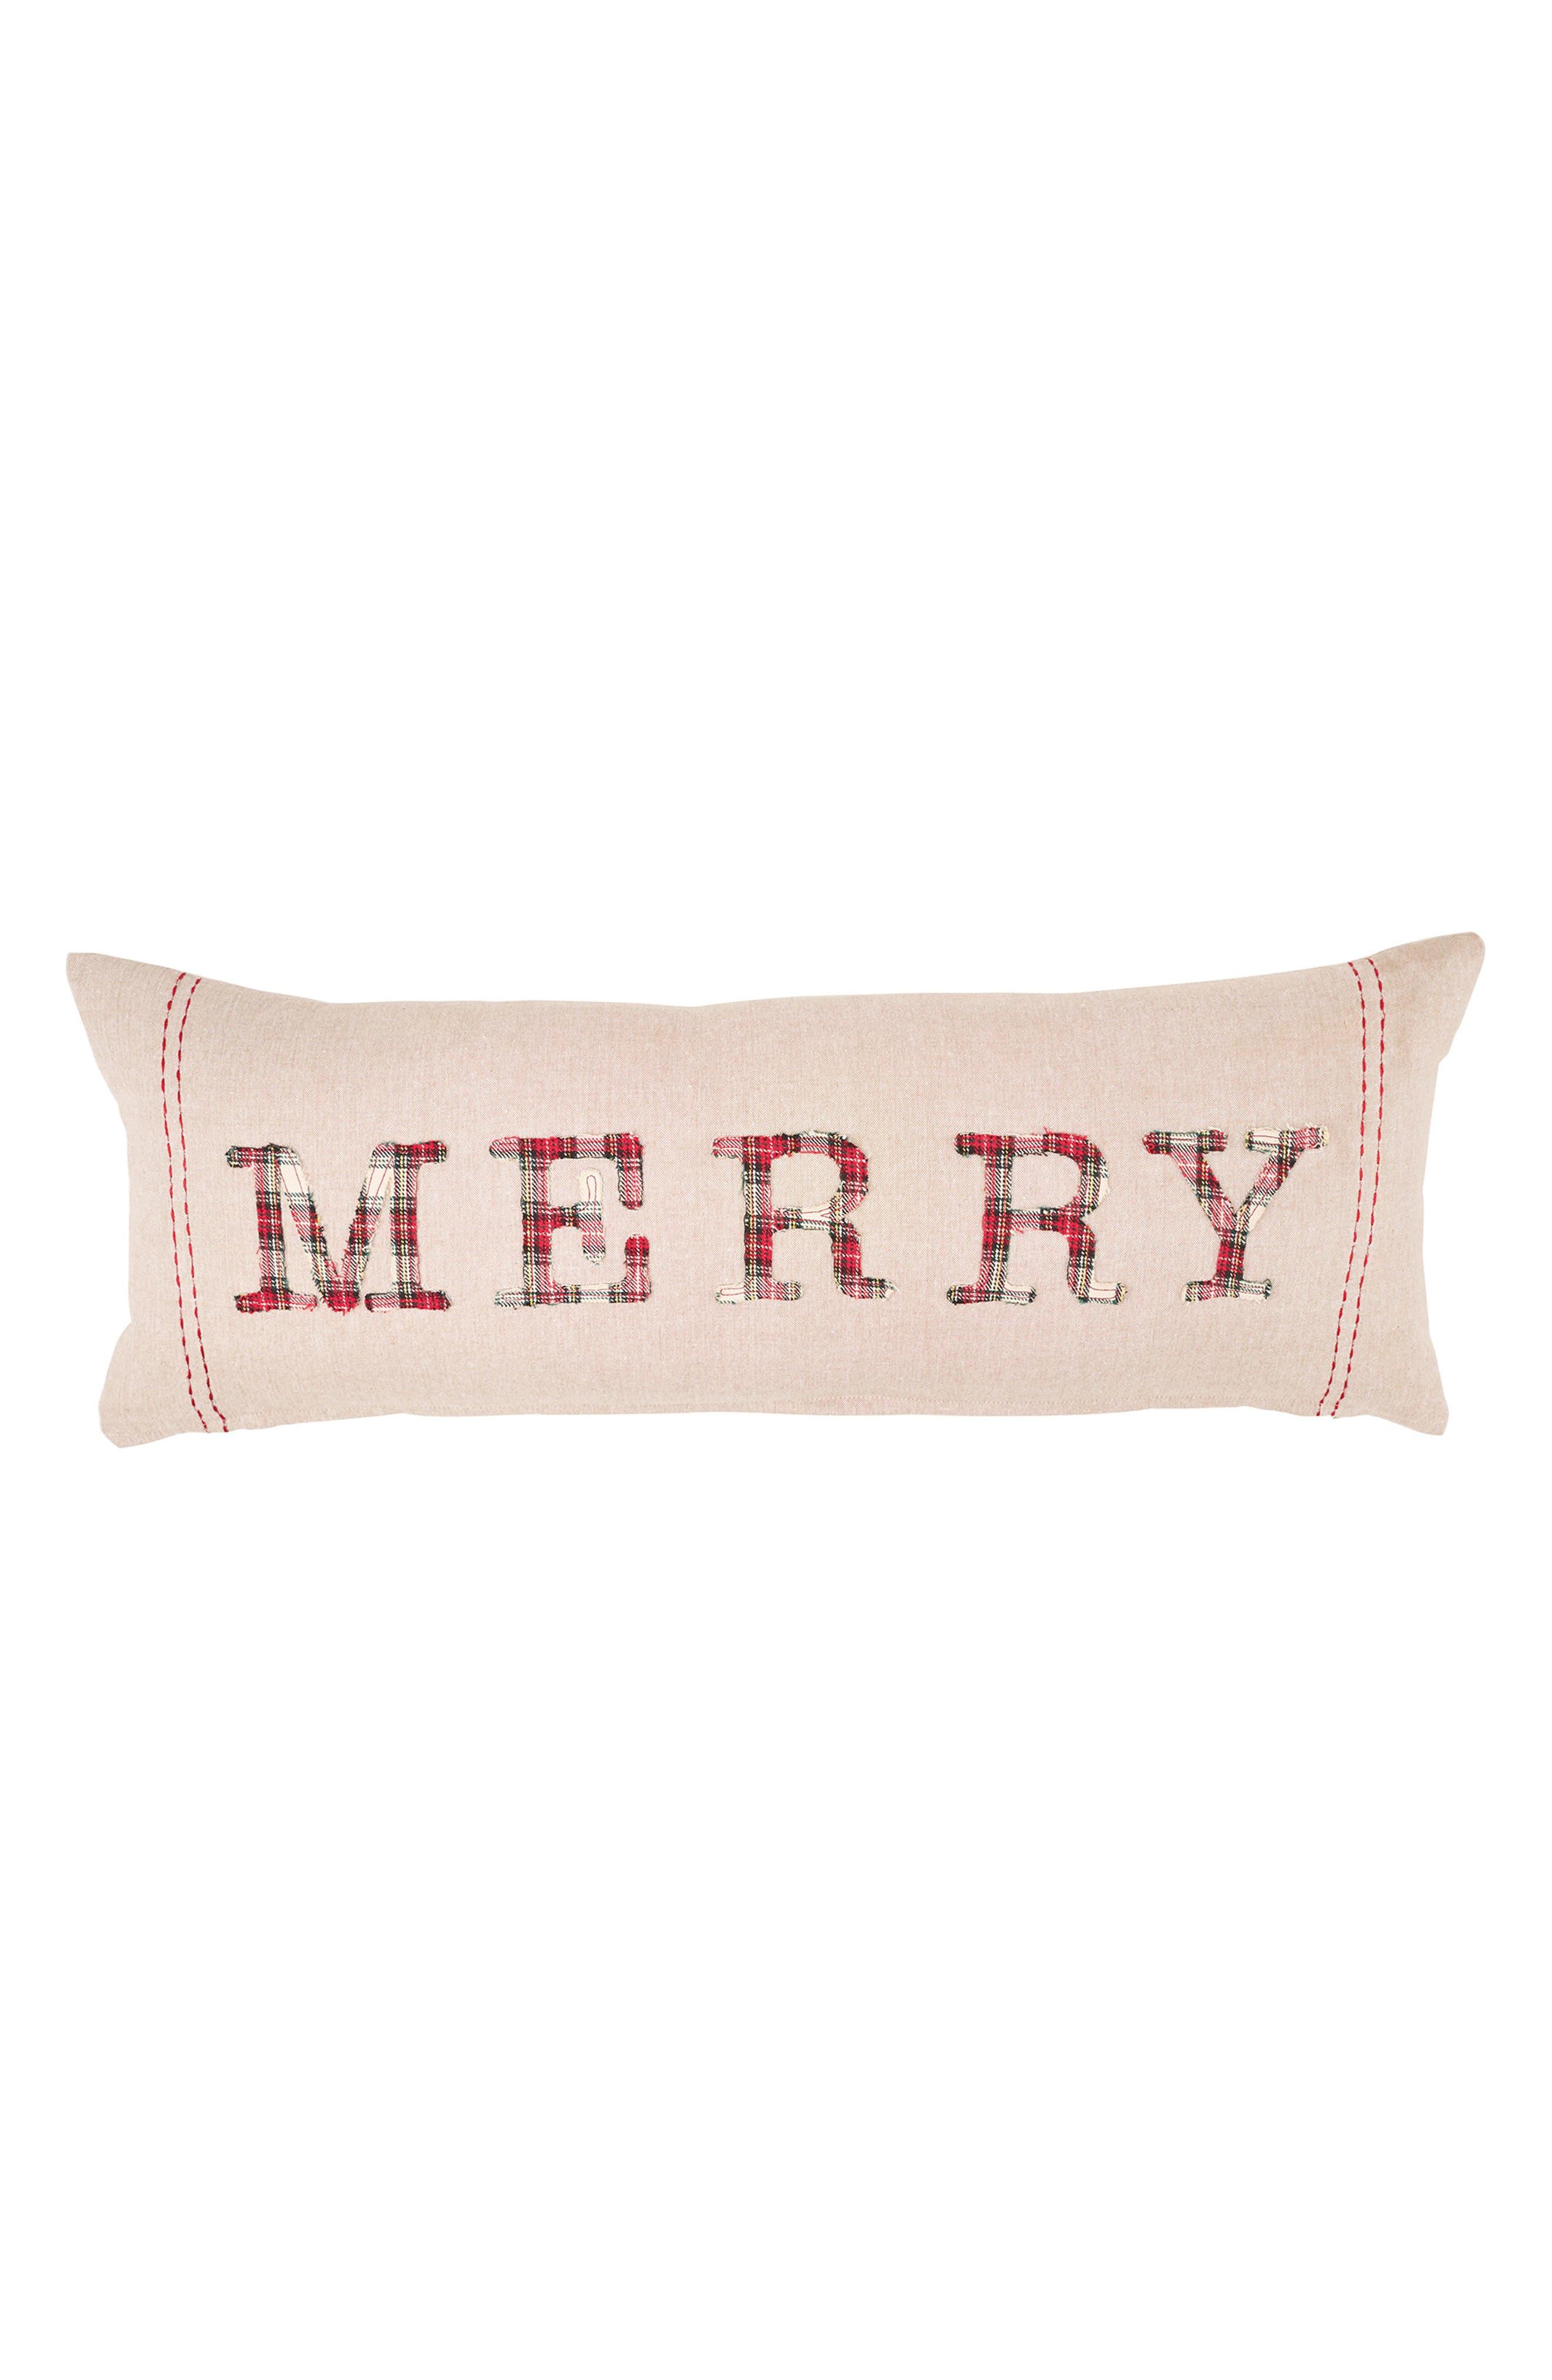 Alternate Image 1 Selected - Mud Pie Merry Tartan Appliqué Accent Pillow